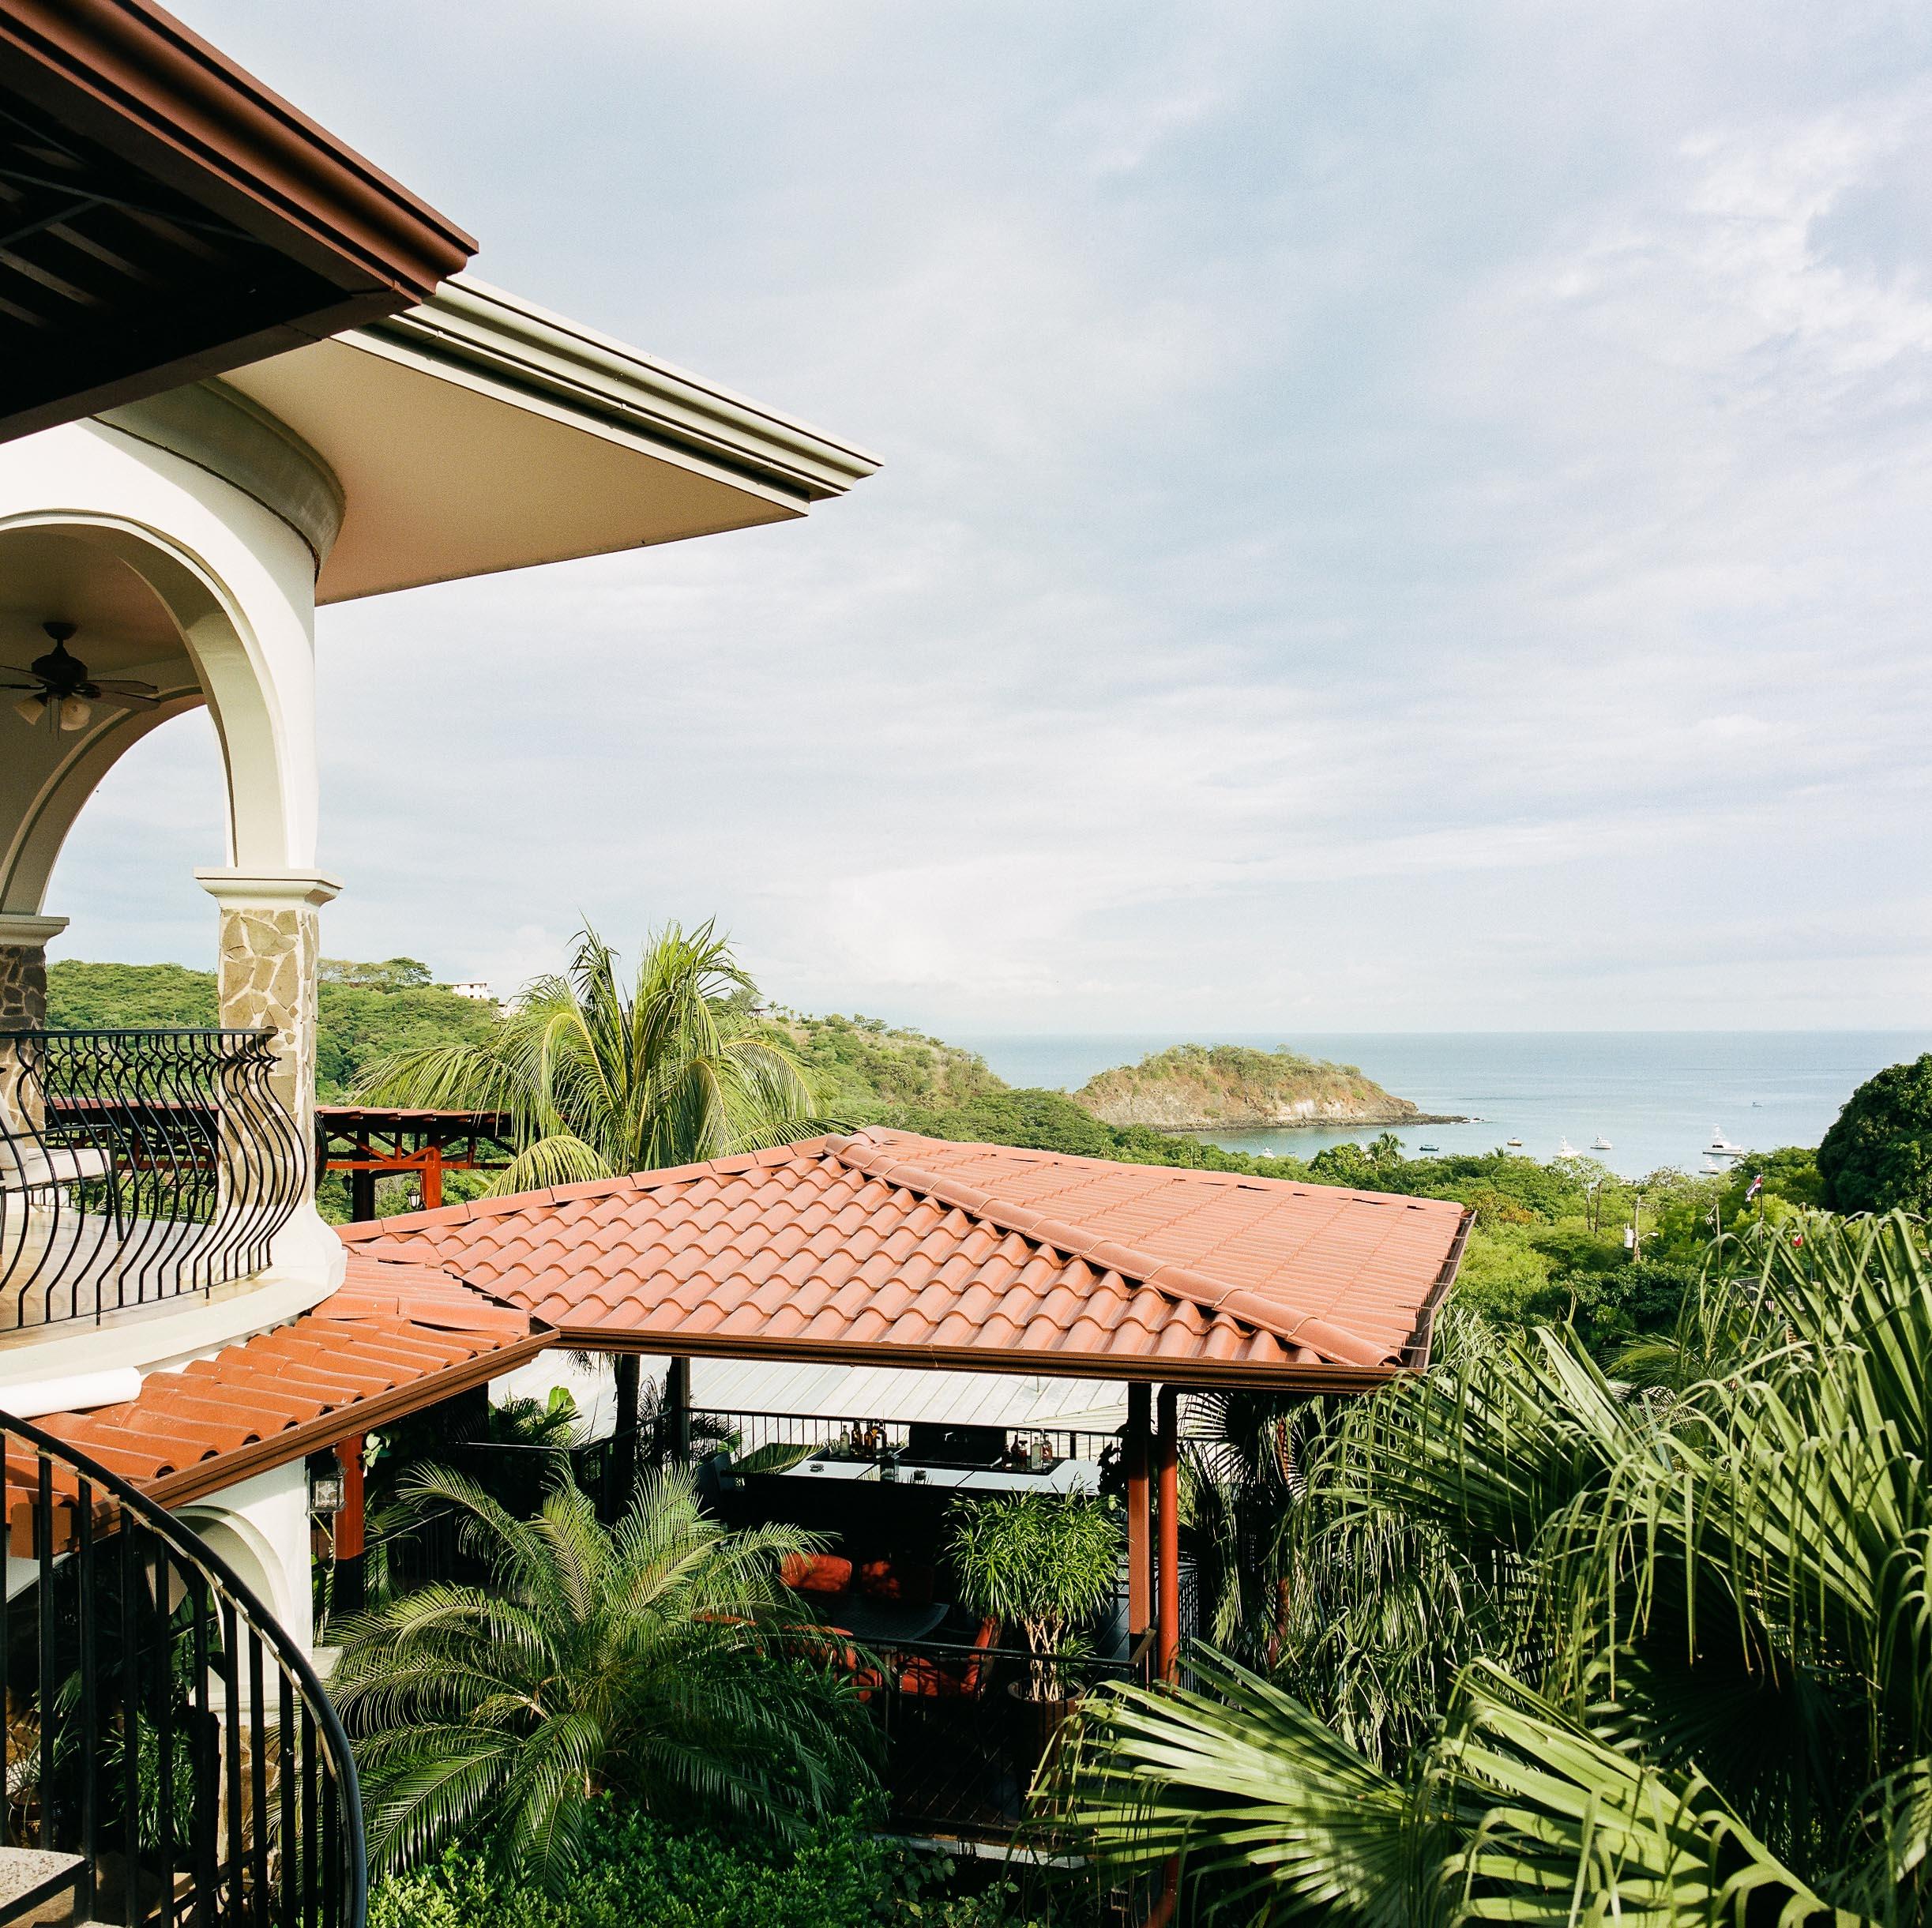 Villa Cascada overlooking Ocotal Bay ■ Hasselblad 500c/m ■ Kodak Portra 400